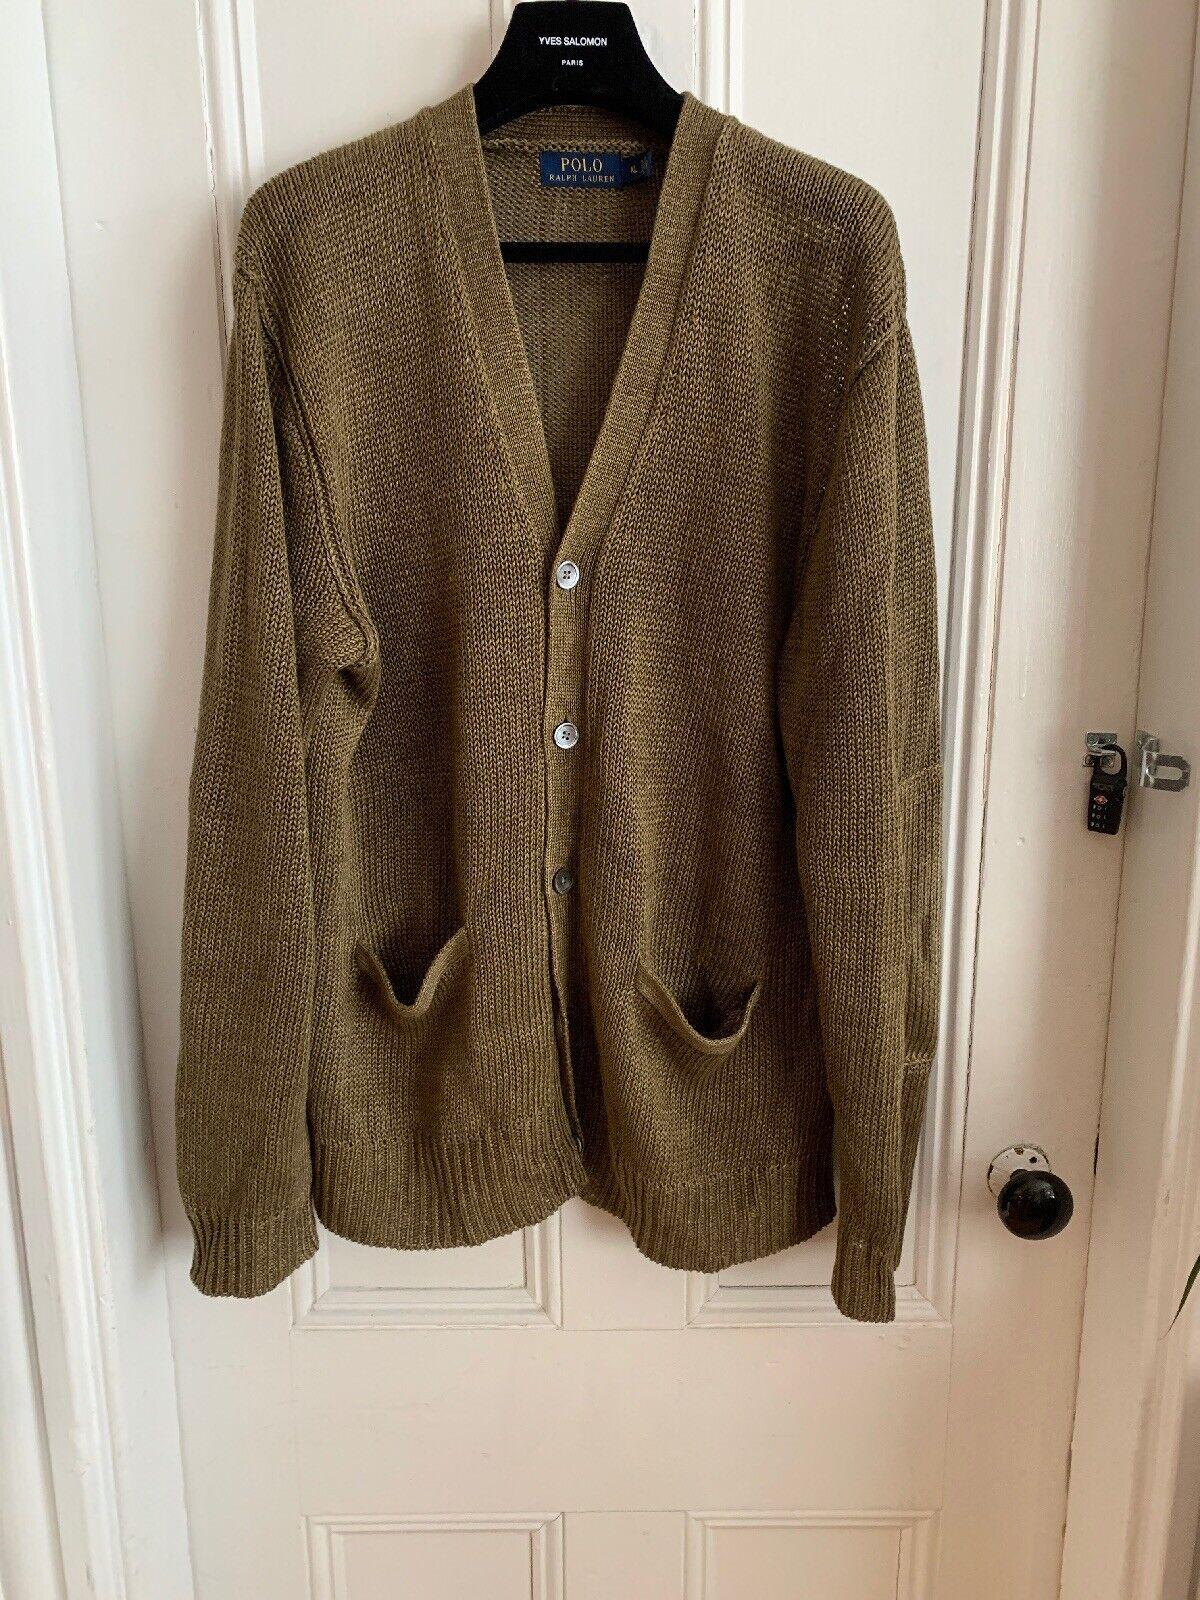 Polo Raph Lauren Linen Olive Grün Cardigan Größe Xl